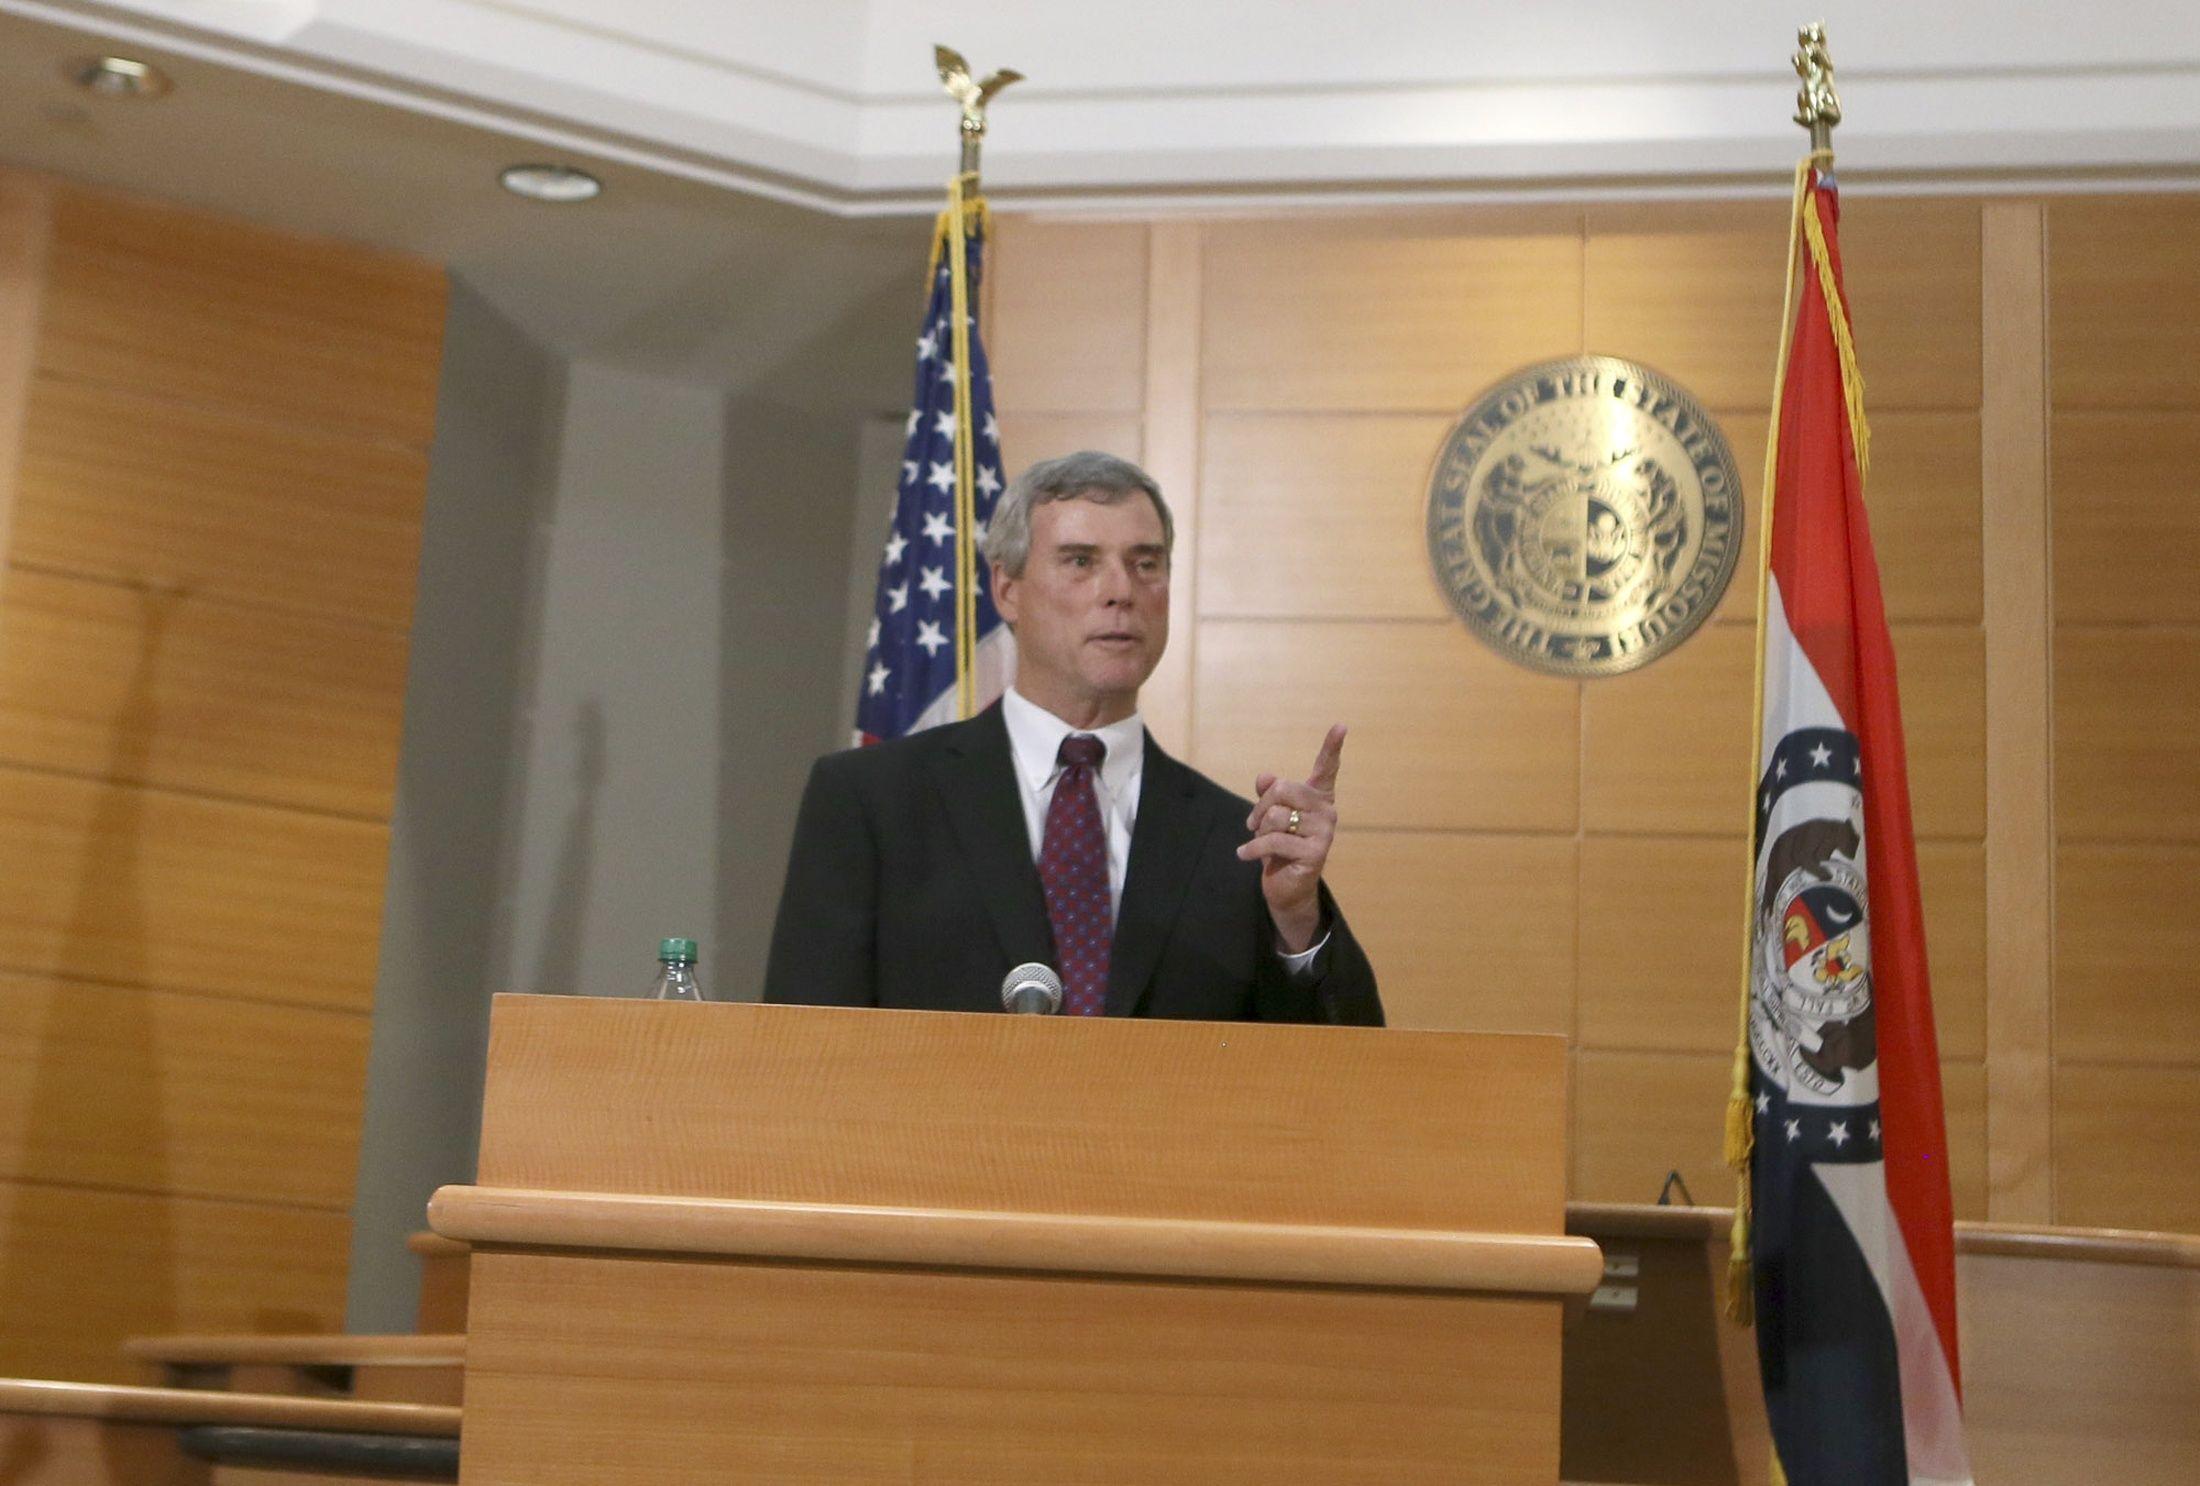 St. Louis County Prosecutor Bob McCulloch allowed false testimony